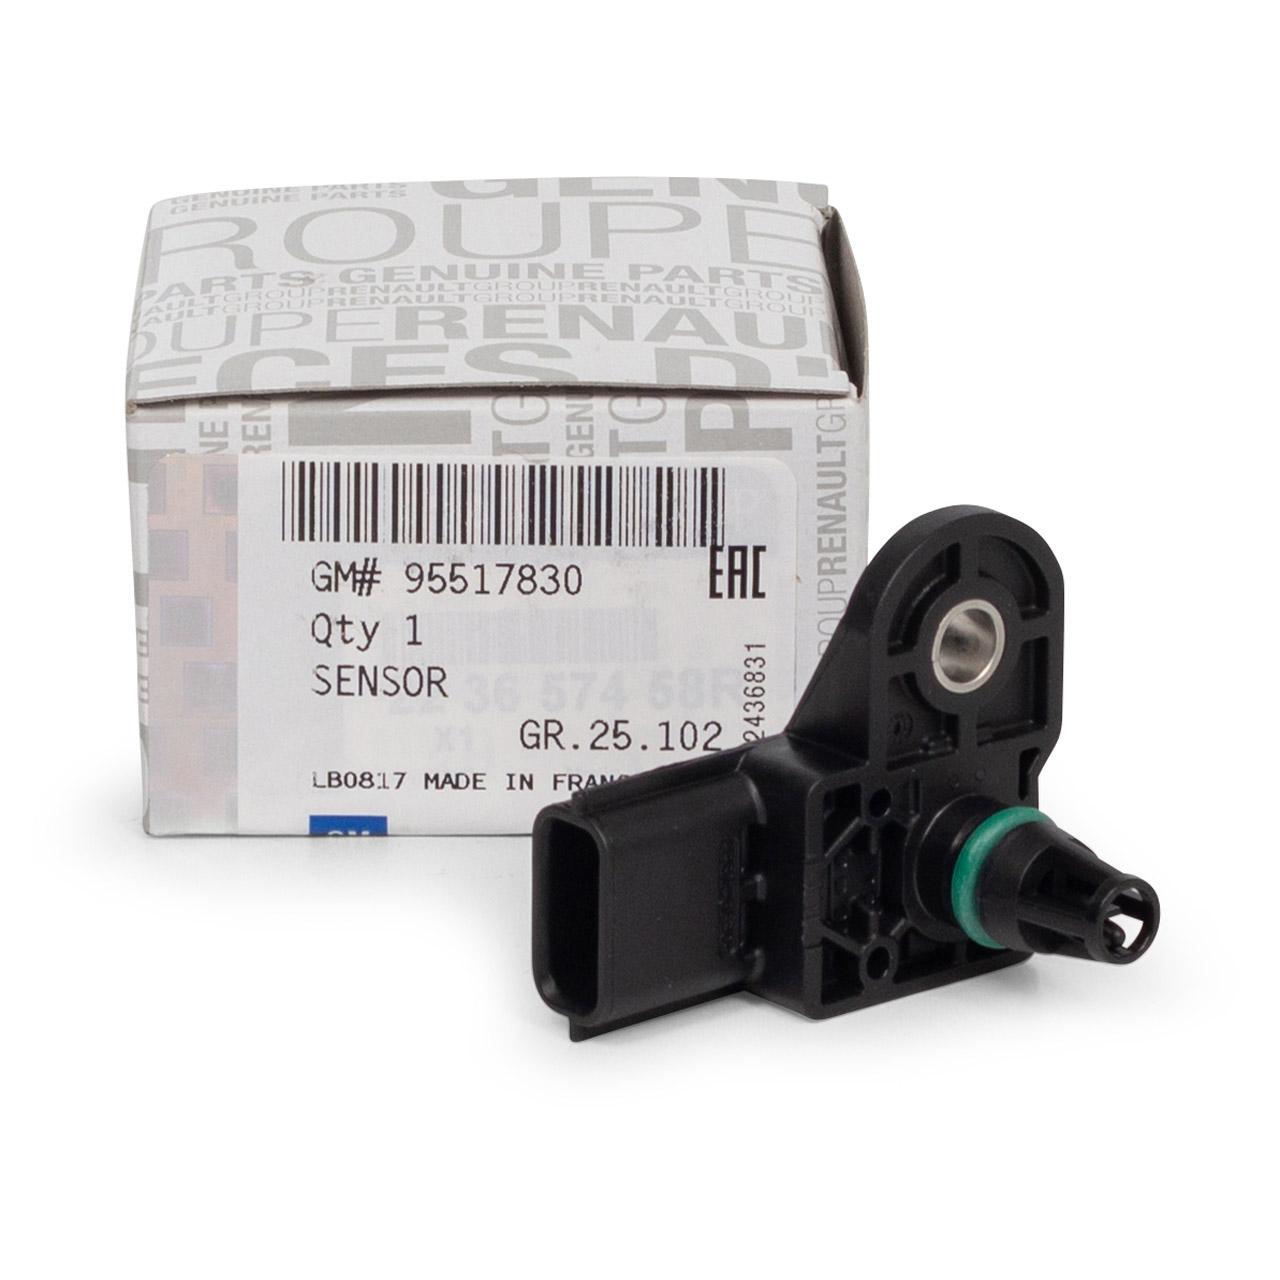 ORIGINAL Opel Saugrohrdruck Ladedruck Unterdrucksensor VIVARO B 1.6 CDTI 95517830